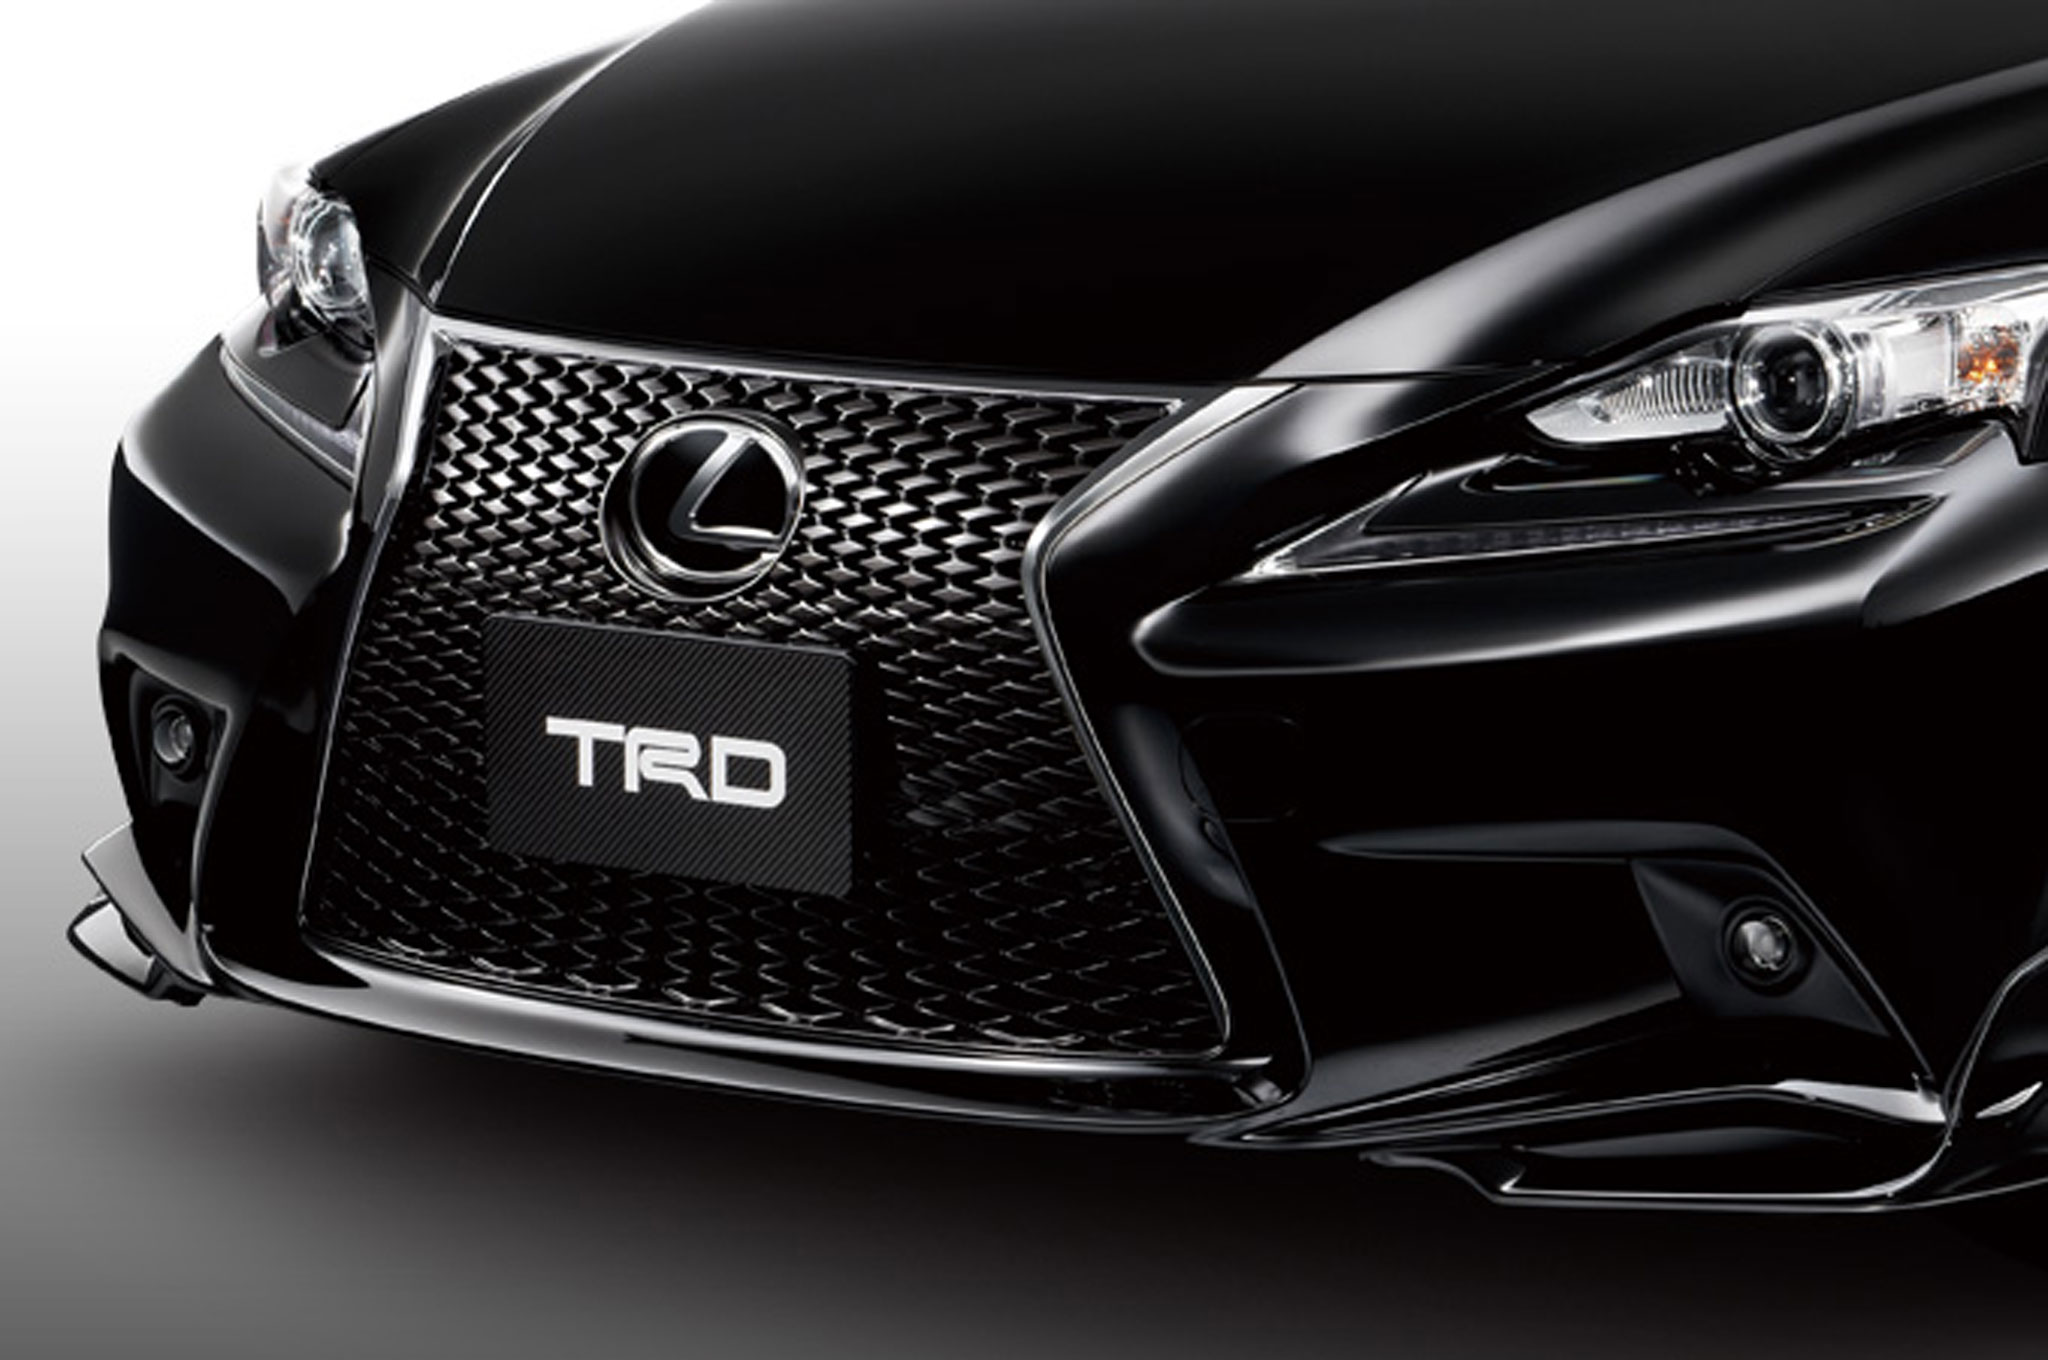 Japanese Spec 2014 Lexus IS F Sport TRD Front Bumper1